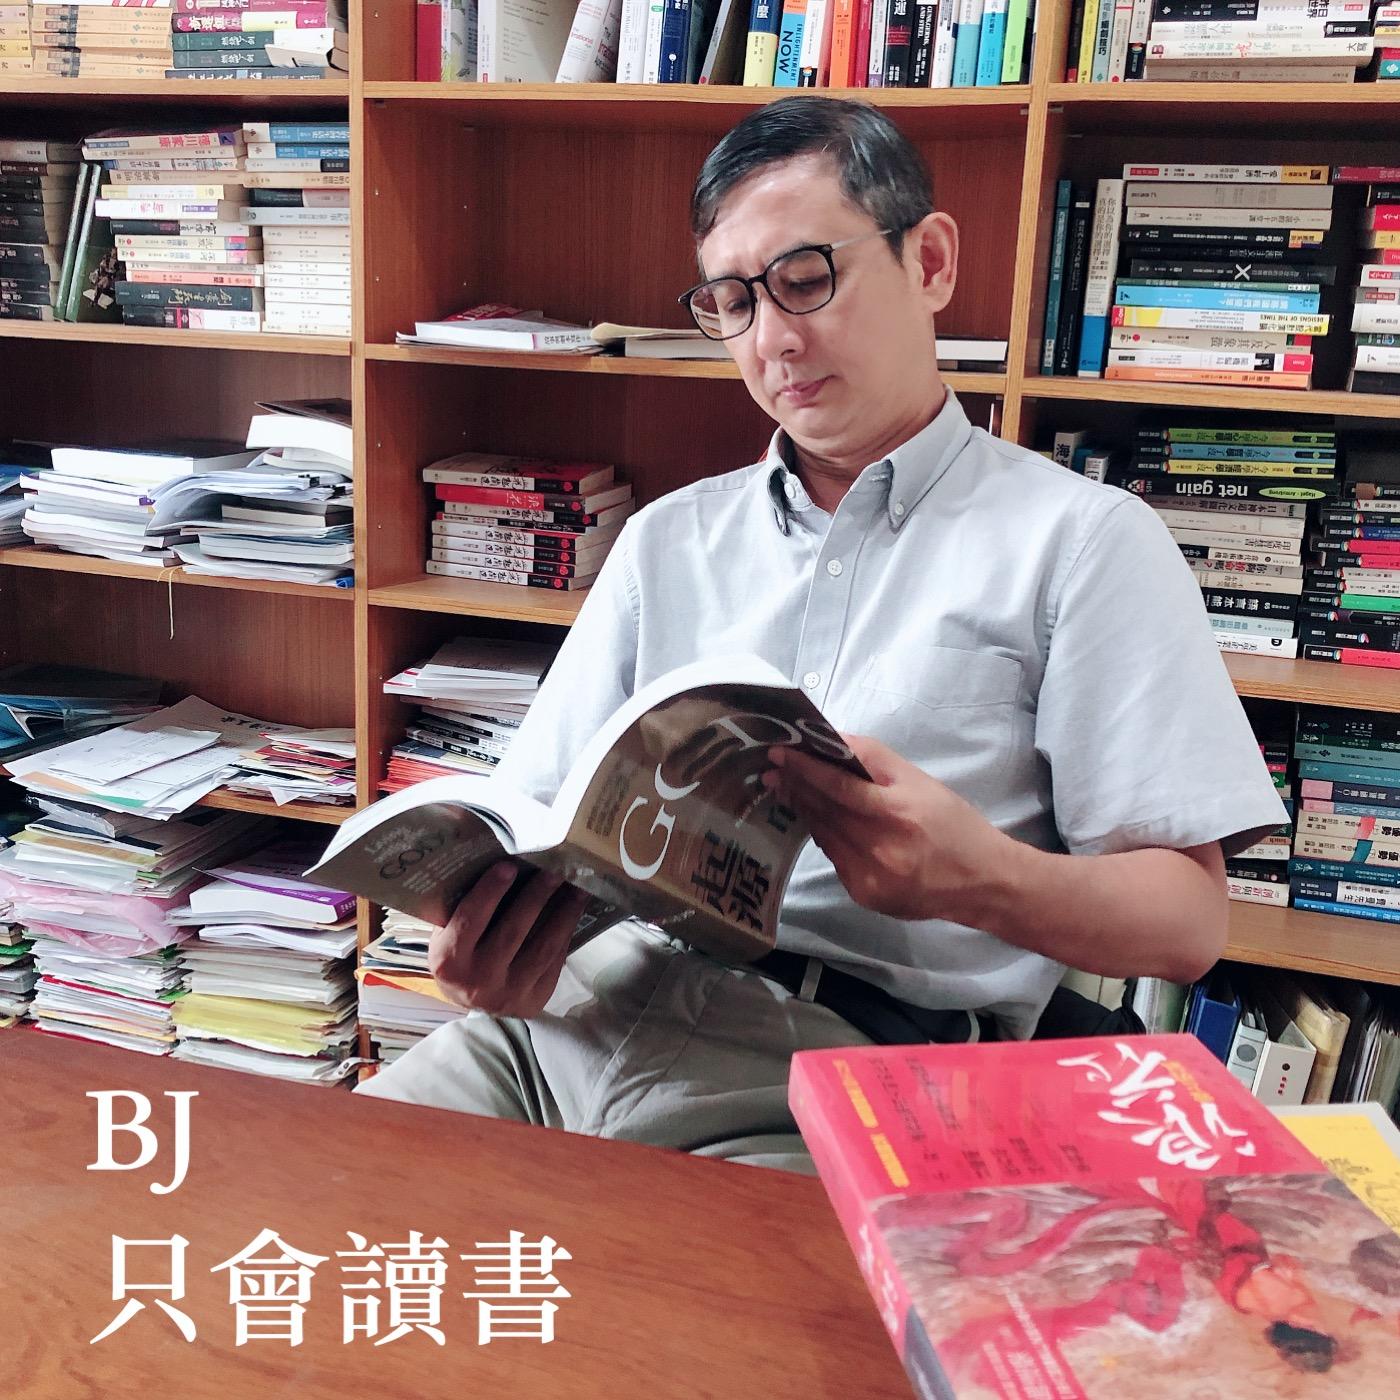 EP001【BJ只會讀書初登場】